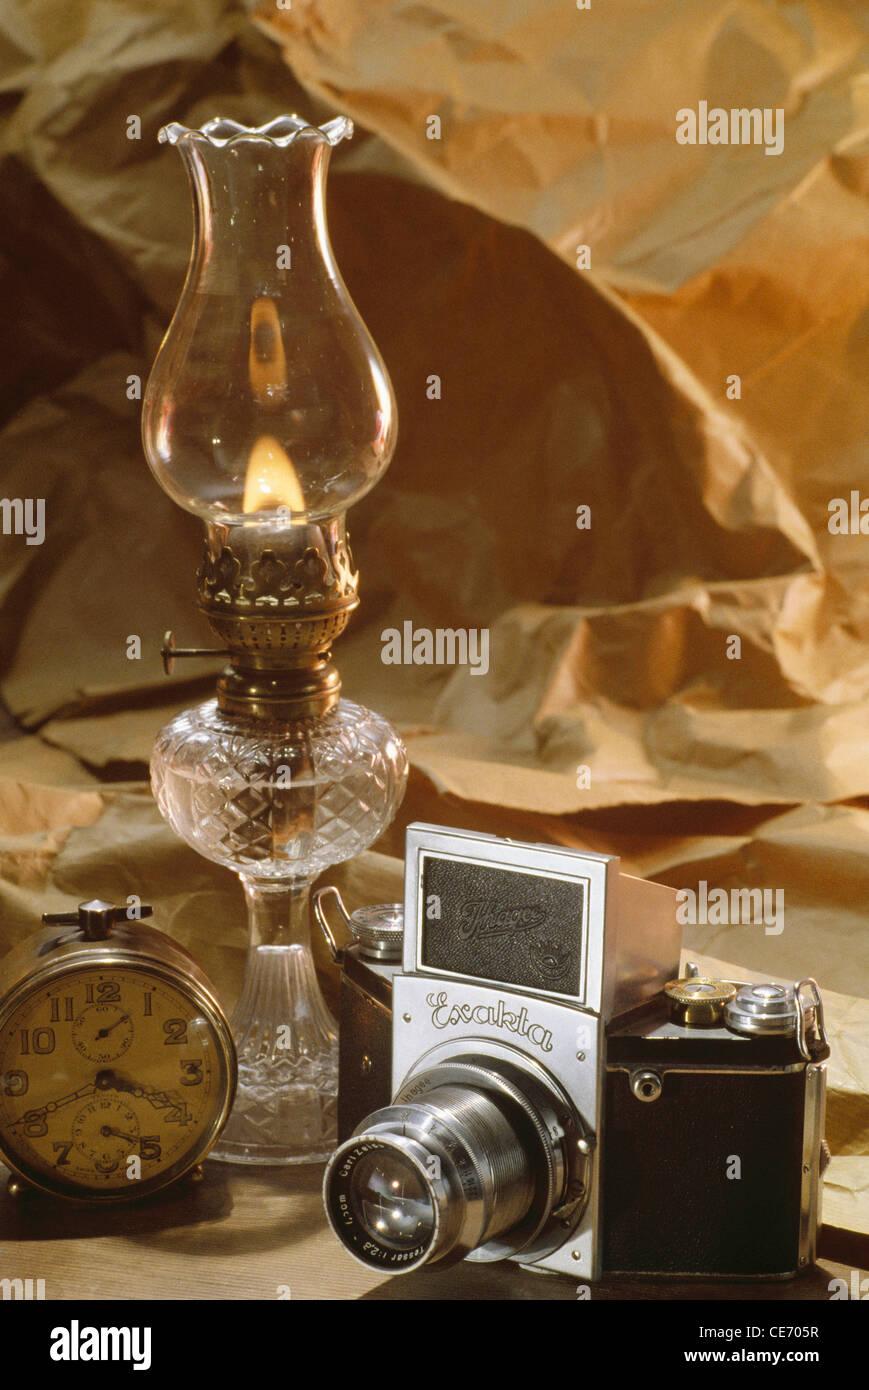 AAD 83956 : old exacta camera alarm clock kerosene lamp - Stock Image